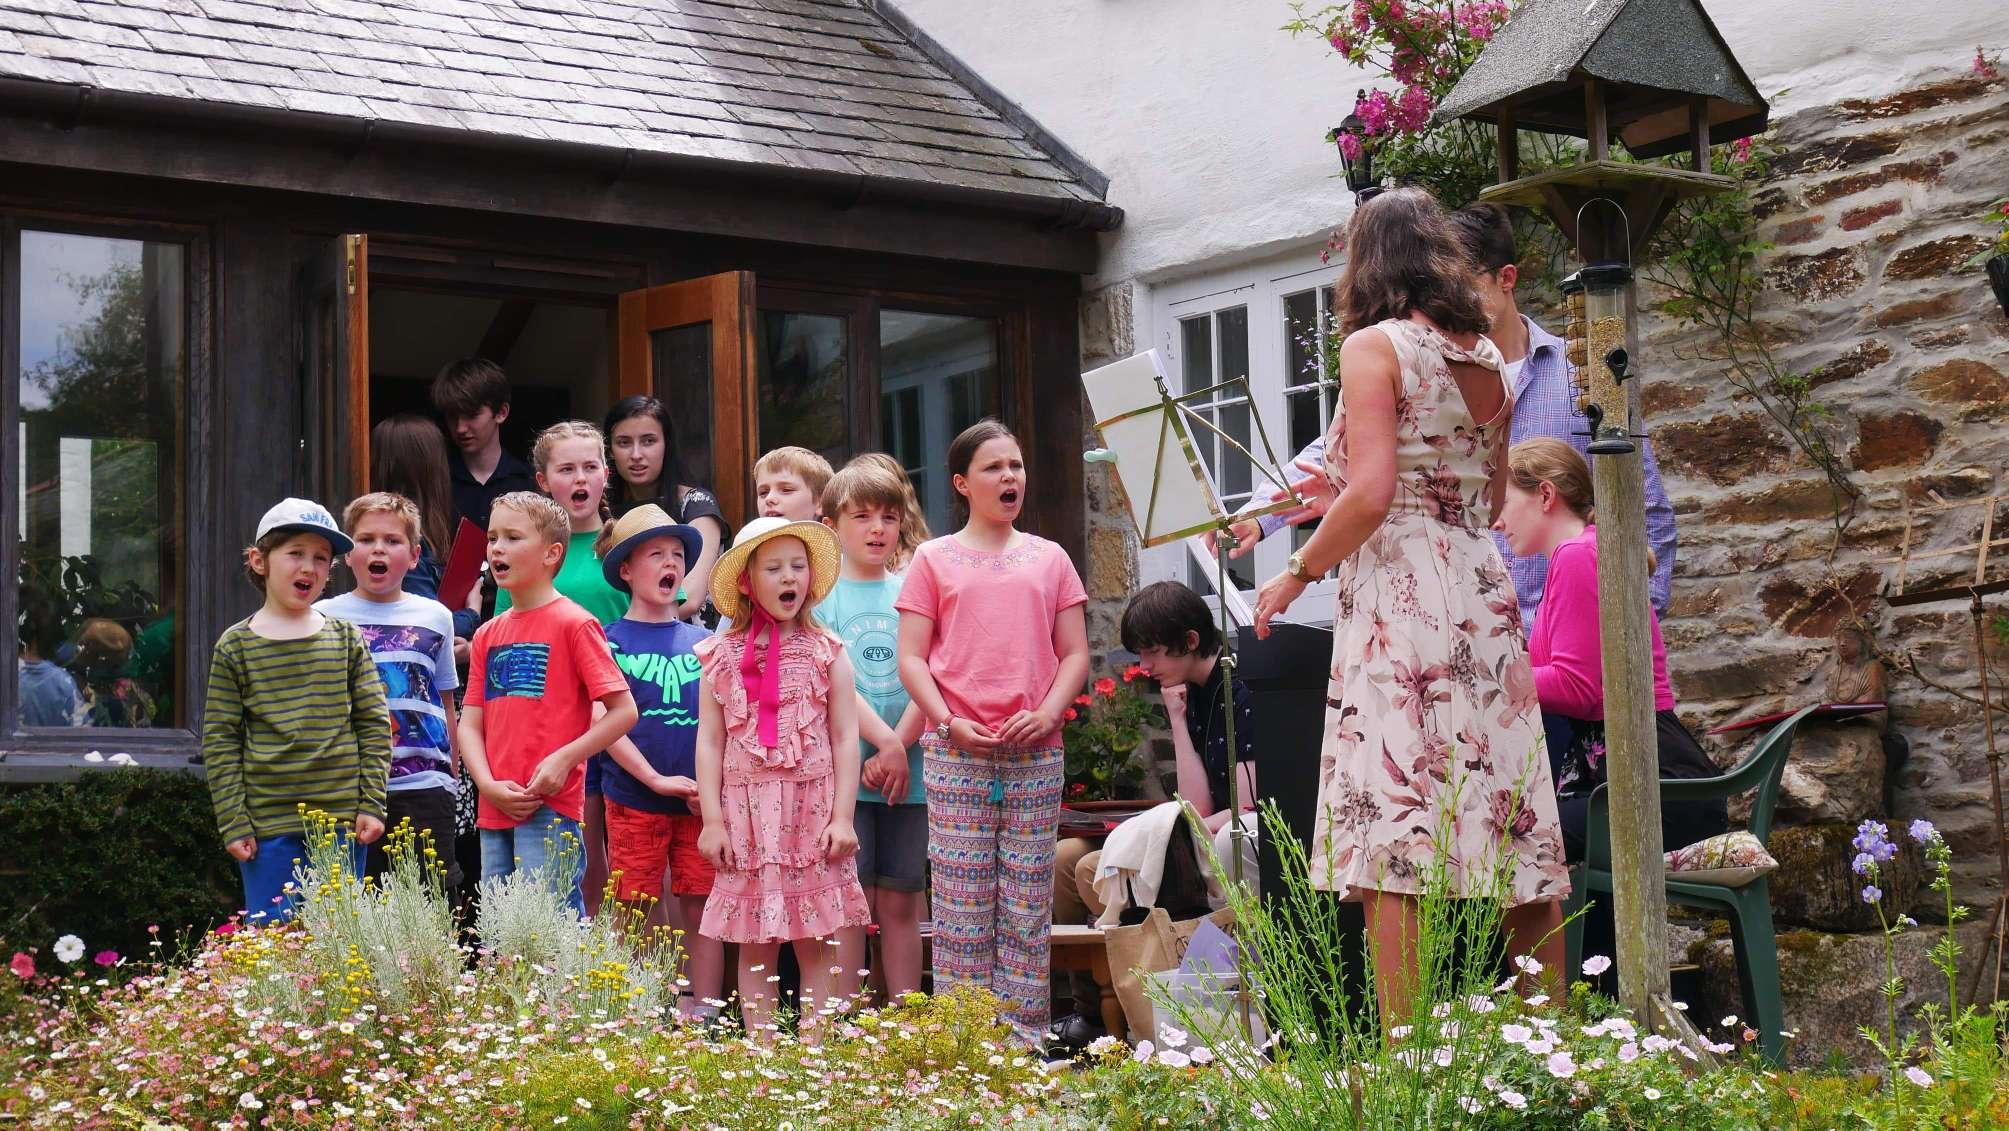 Cornwall Junior Choir in performance at Brackenwoods Open Garden in June under the direction of their then director, Christine Judge.